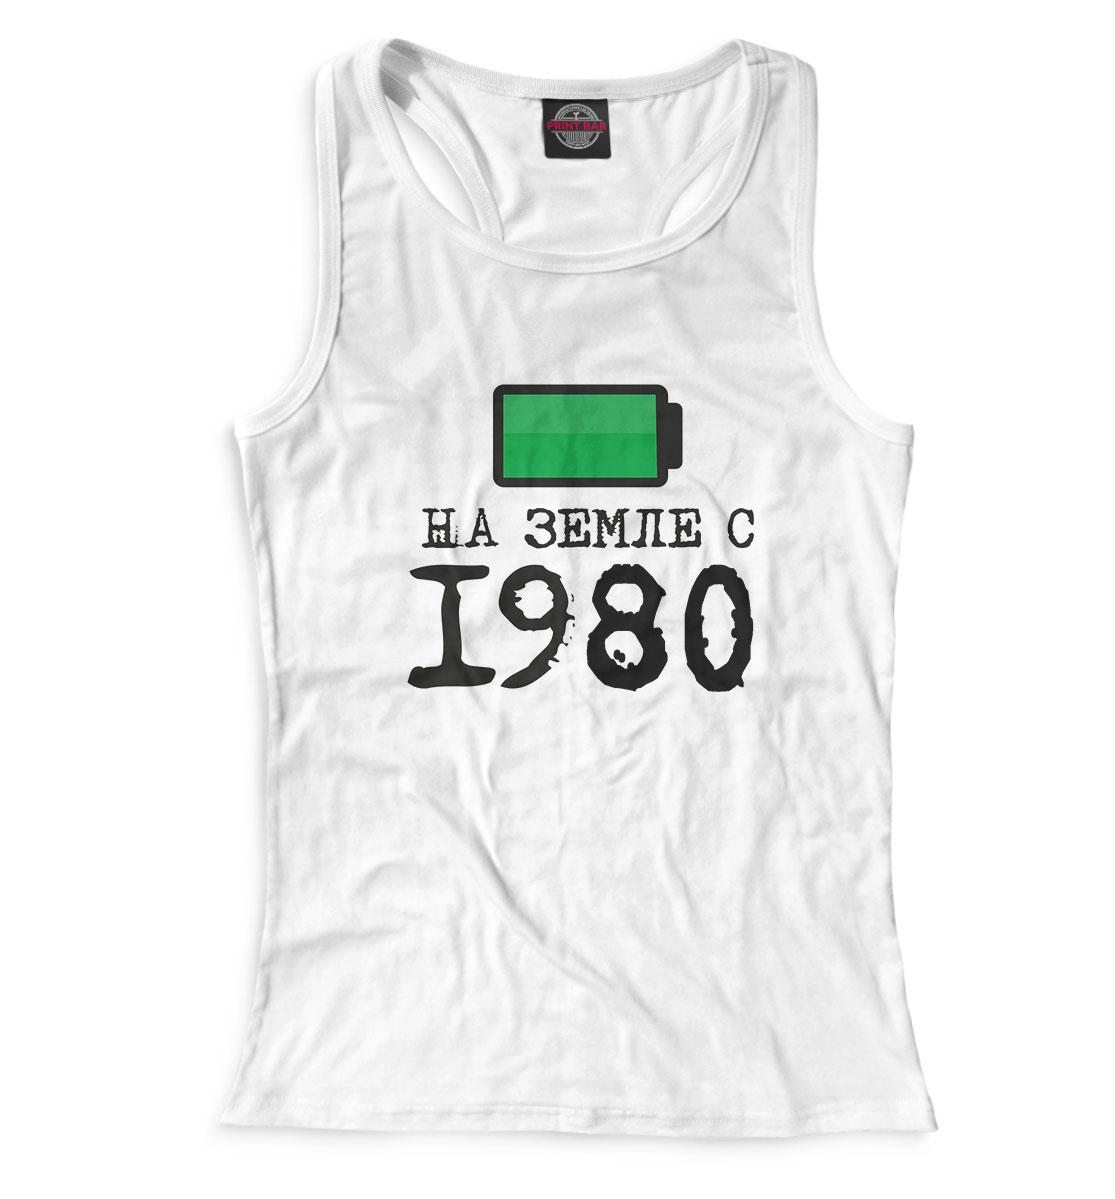 Купить На Земле с 1980, Printbar, Майки борцовки, DVH-212430-mayb-1